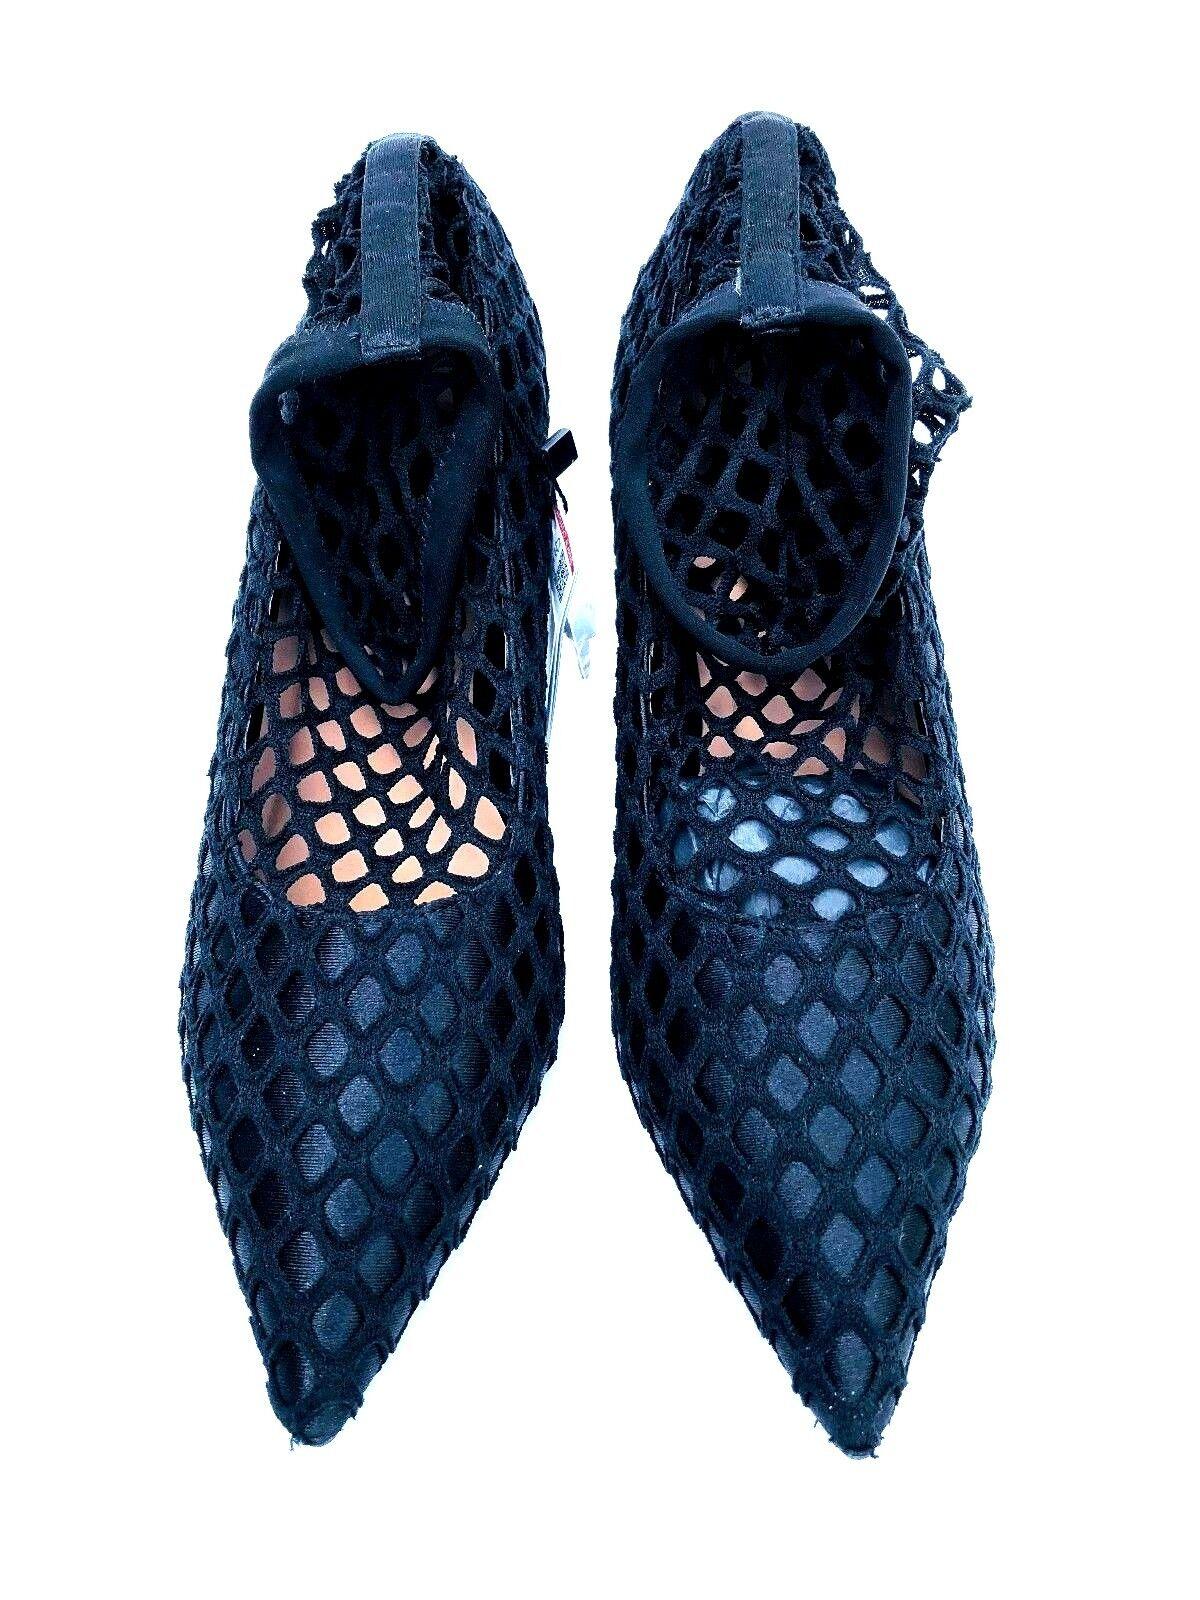 ZARA CUTOUT SOCK HEEL Stiefel Schuhe 5 SIZE UK 3 4 5 Schuhe 6 REF 7226 201 991ee0